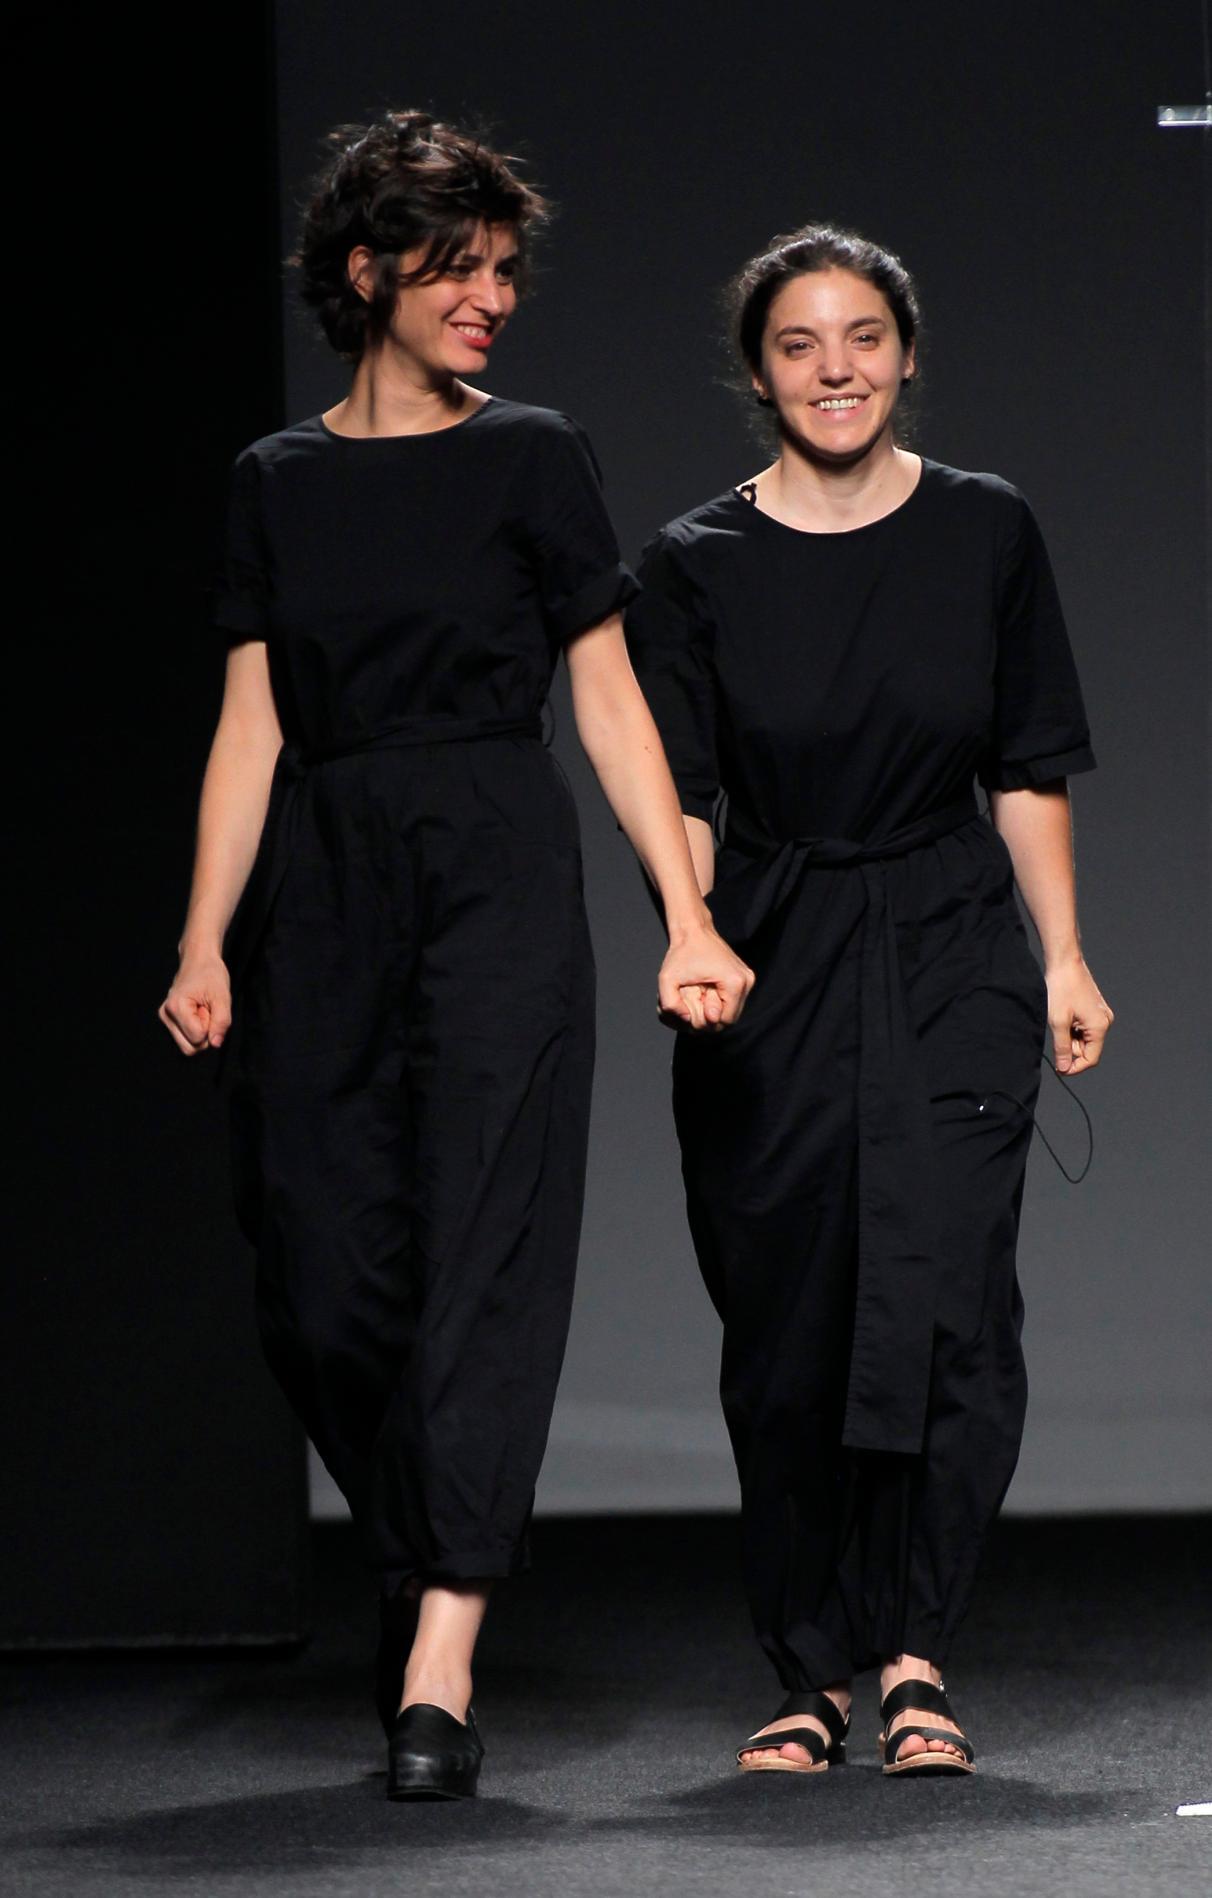 Elena Zapico en 2017 ganadora con la firma ZAP&BUJ Fashion and Architecture del Samsung Ego Innovation Project